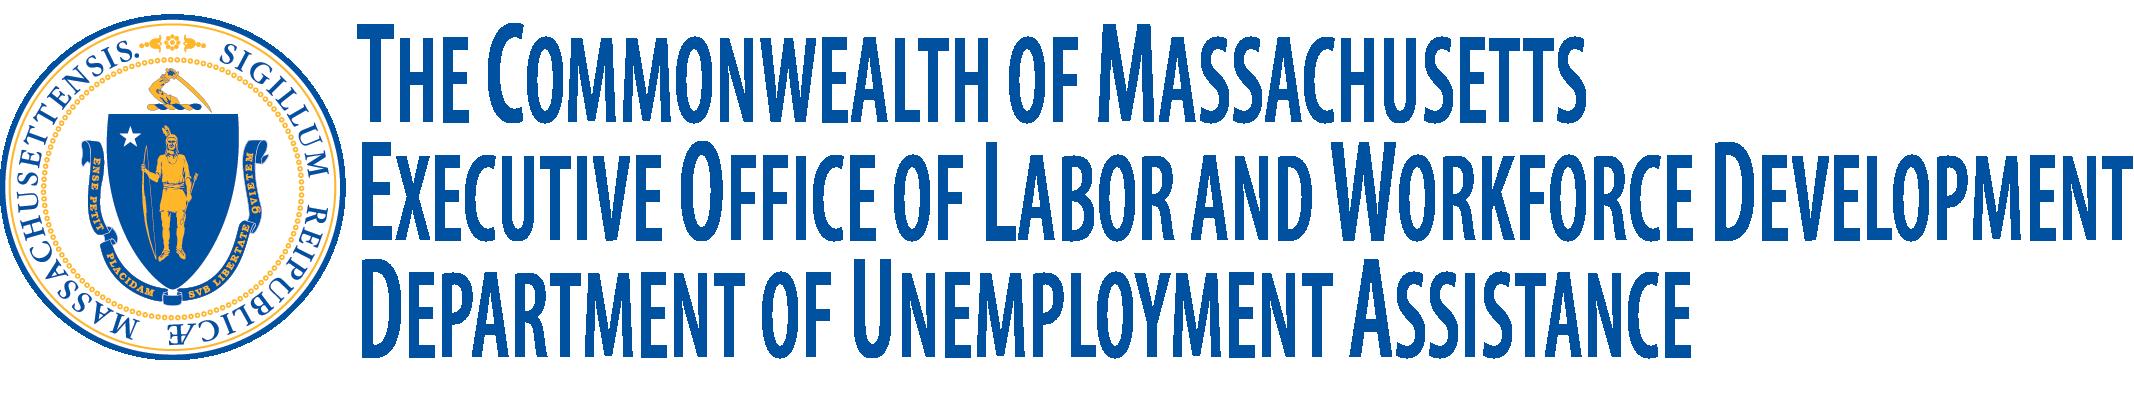 Department of Unemployment Assistance